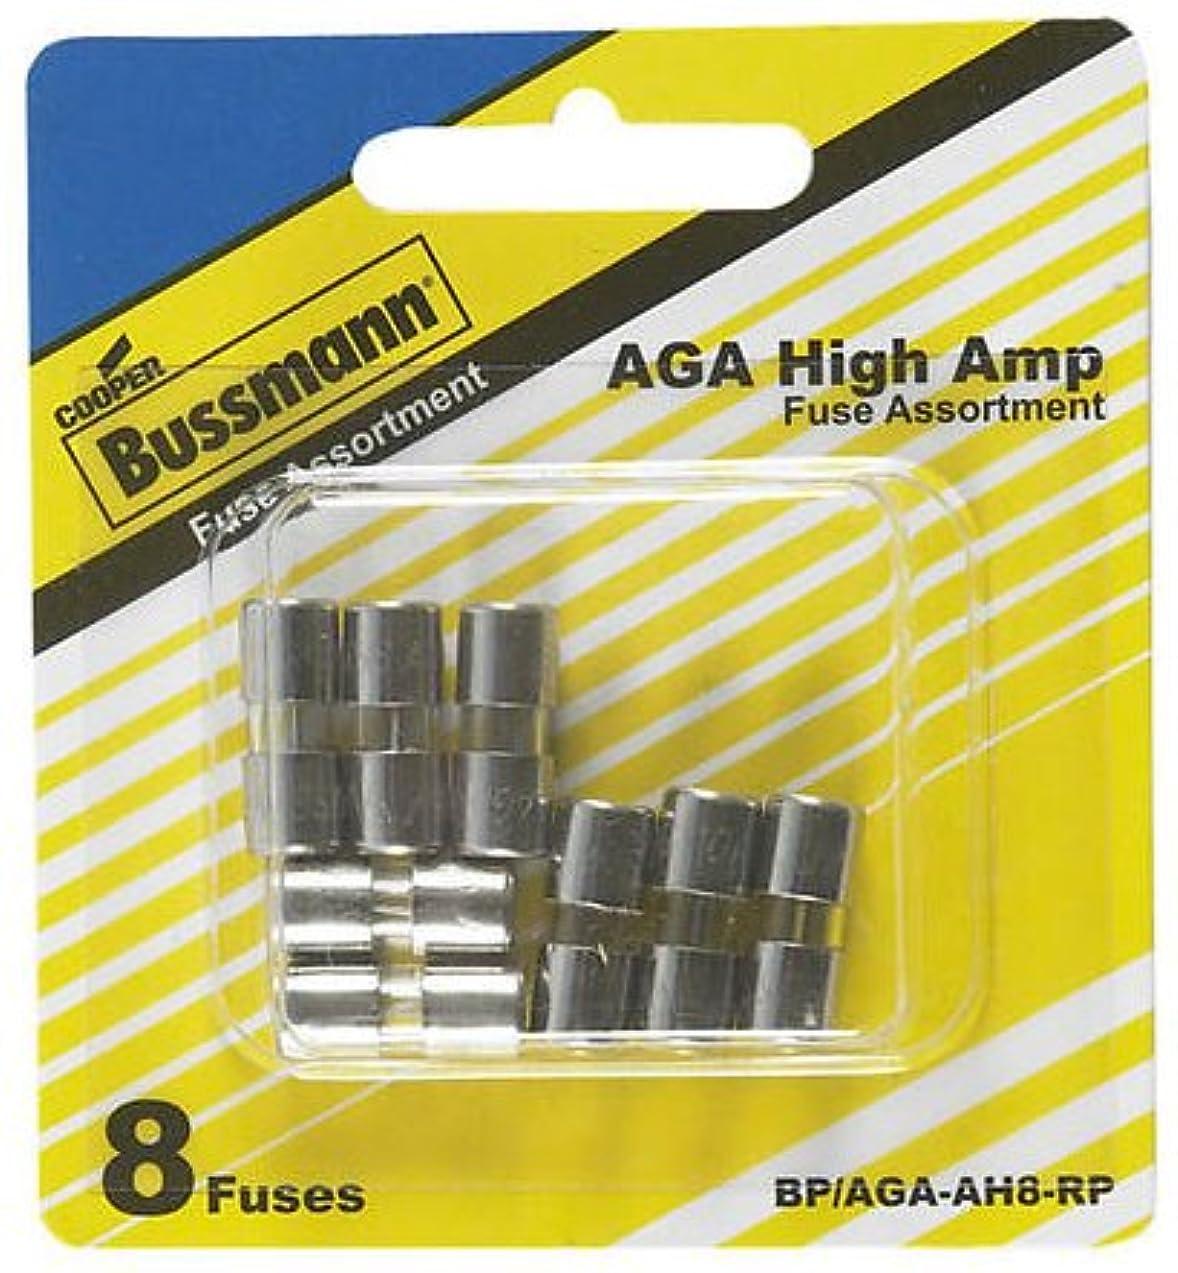 Bussmann BP/AGA-AH8-RP 8 Piece Aga-Xxx High Amp Fuse Assortment (8-Pack),